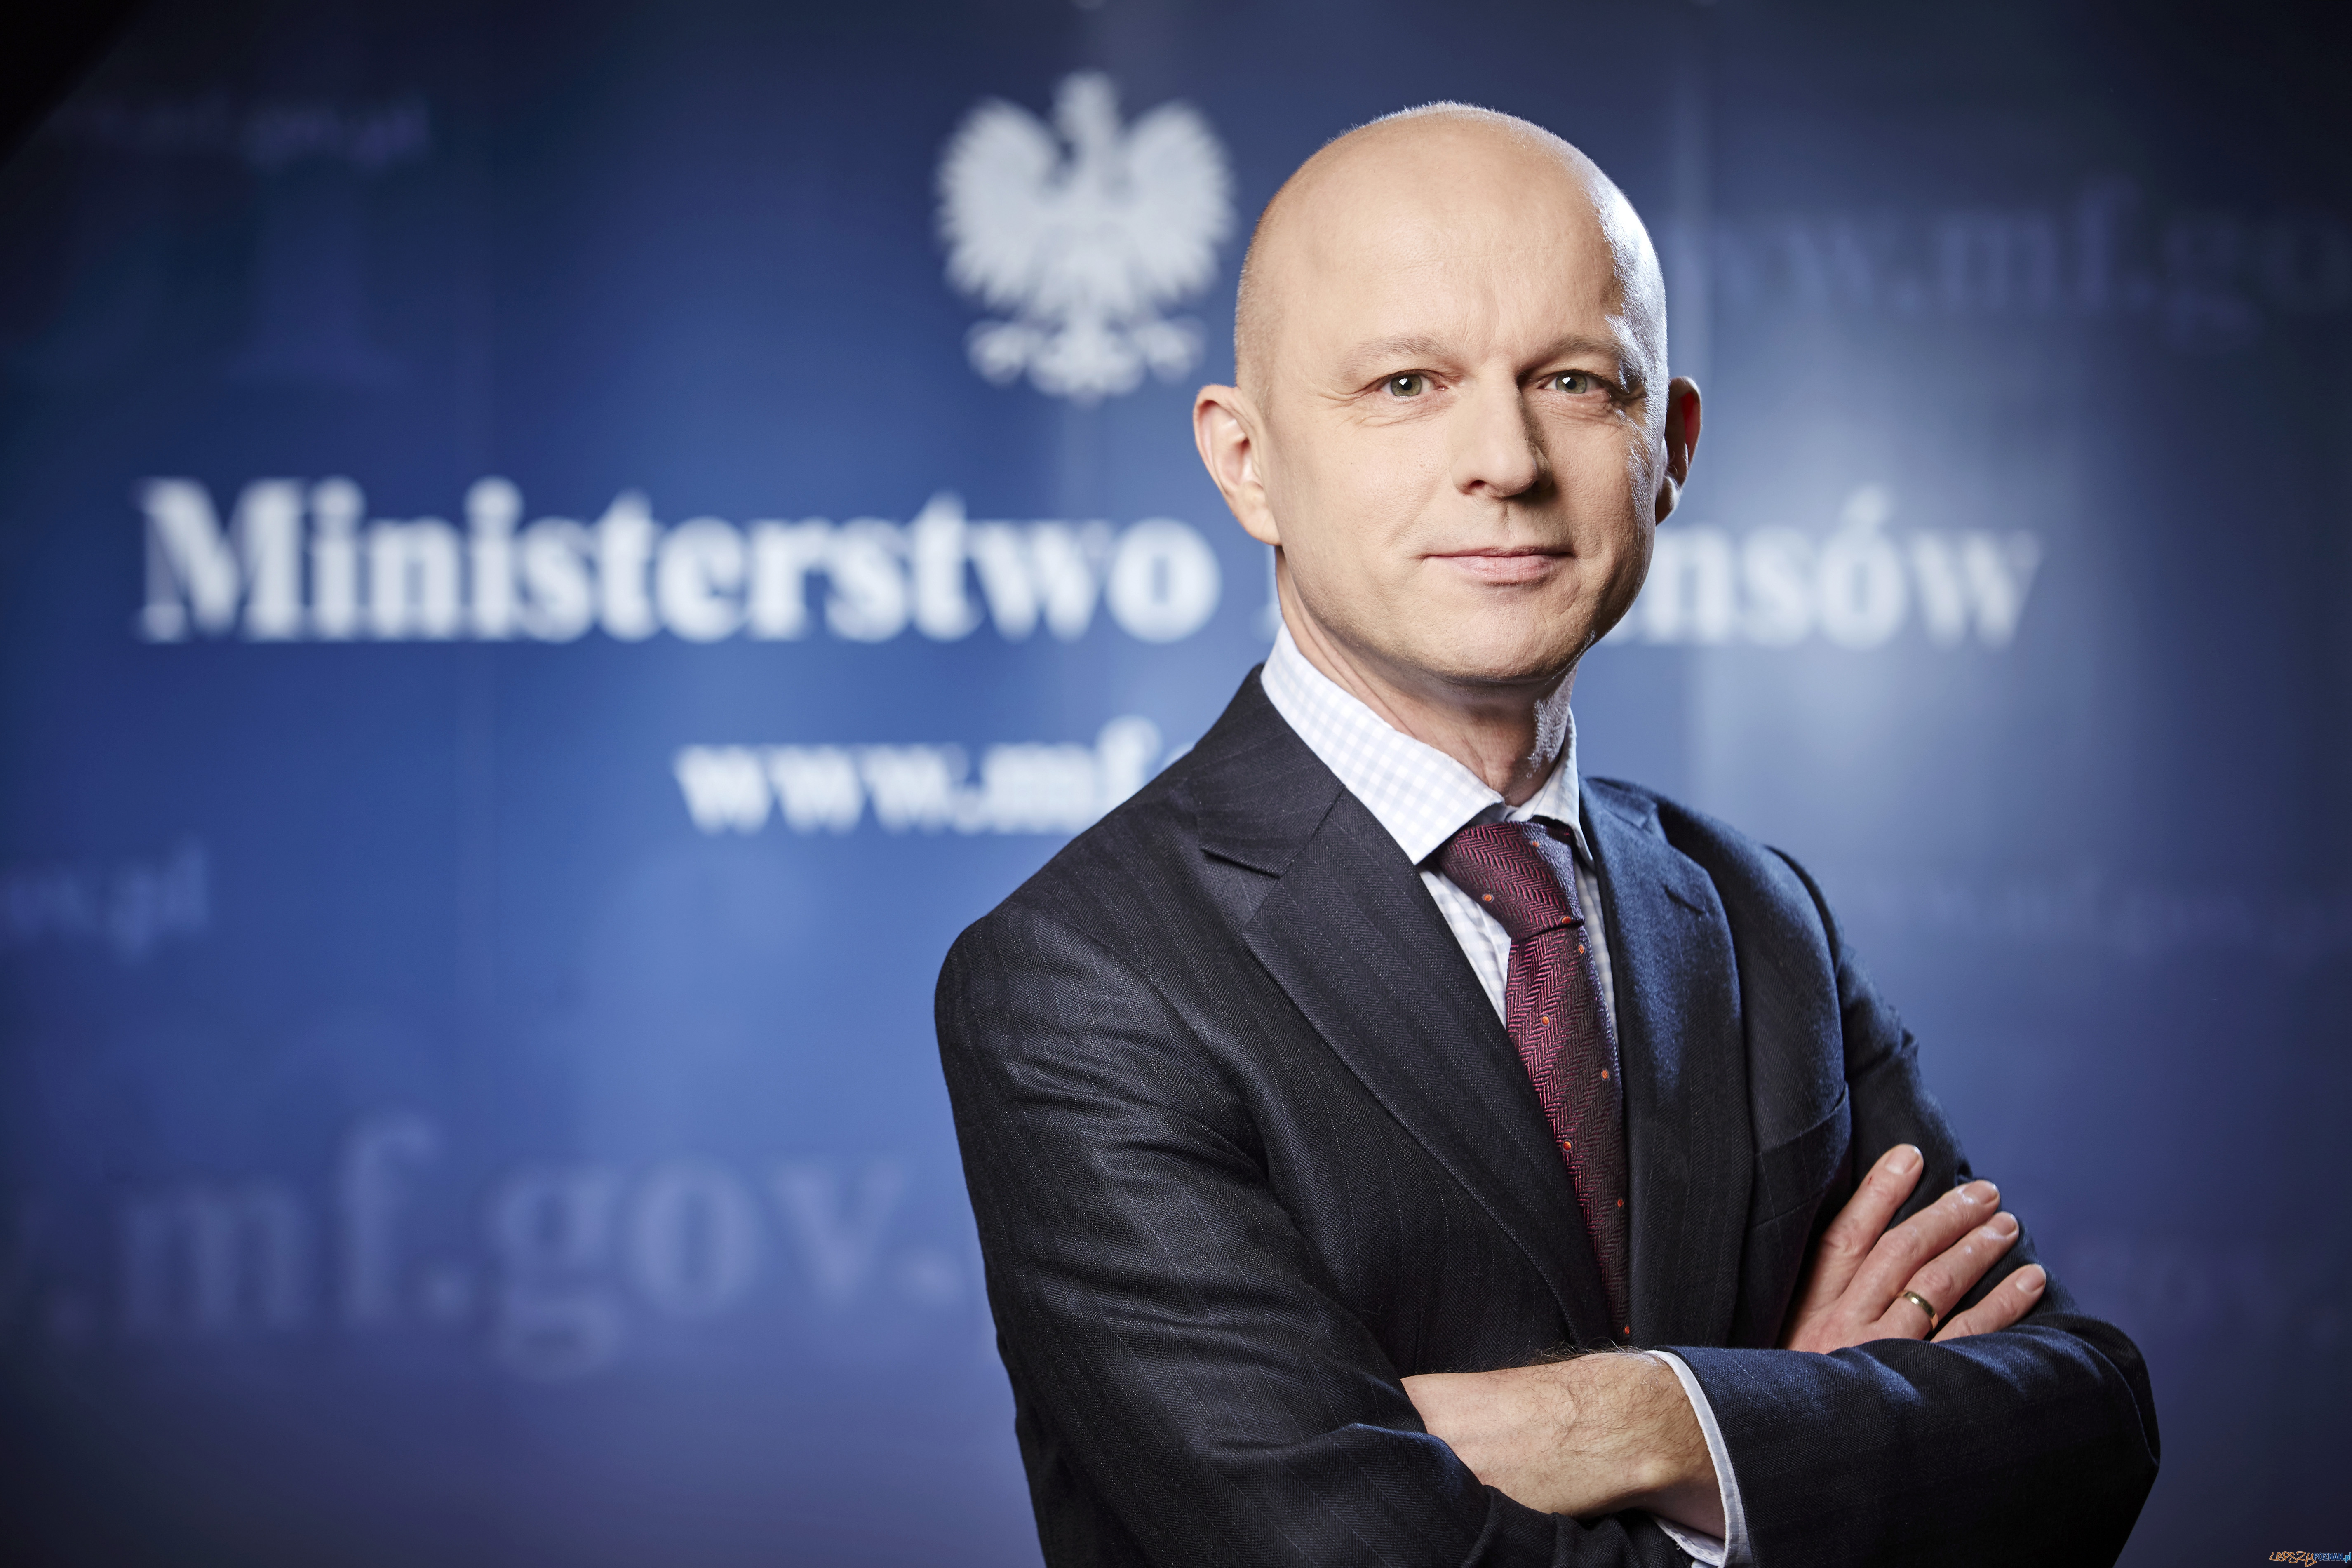 Pawel Szalamacha Minister Finansów - 2016 fot. Dariusz Iwanski www.iwanski.com.pl tel. 0048 601 362 305 foto.iwanski@yahoo.com